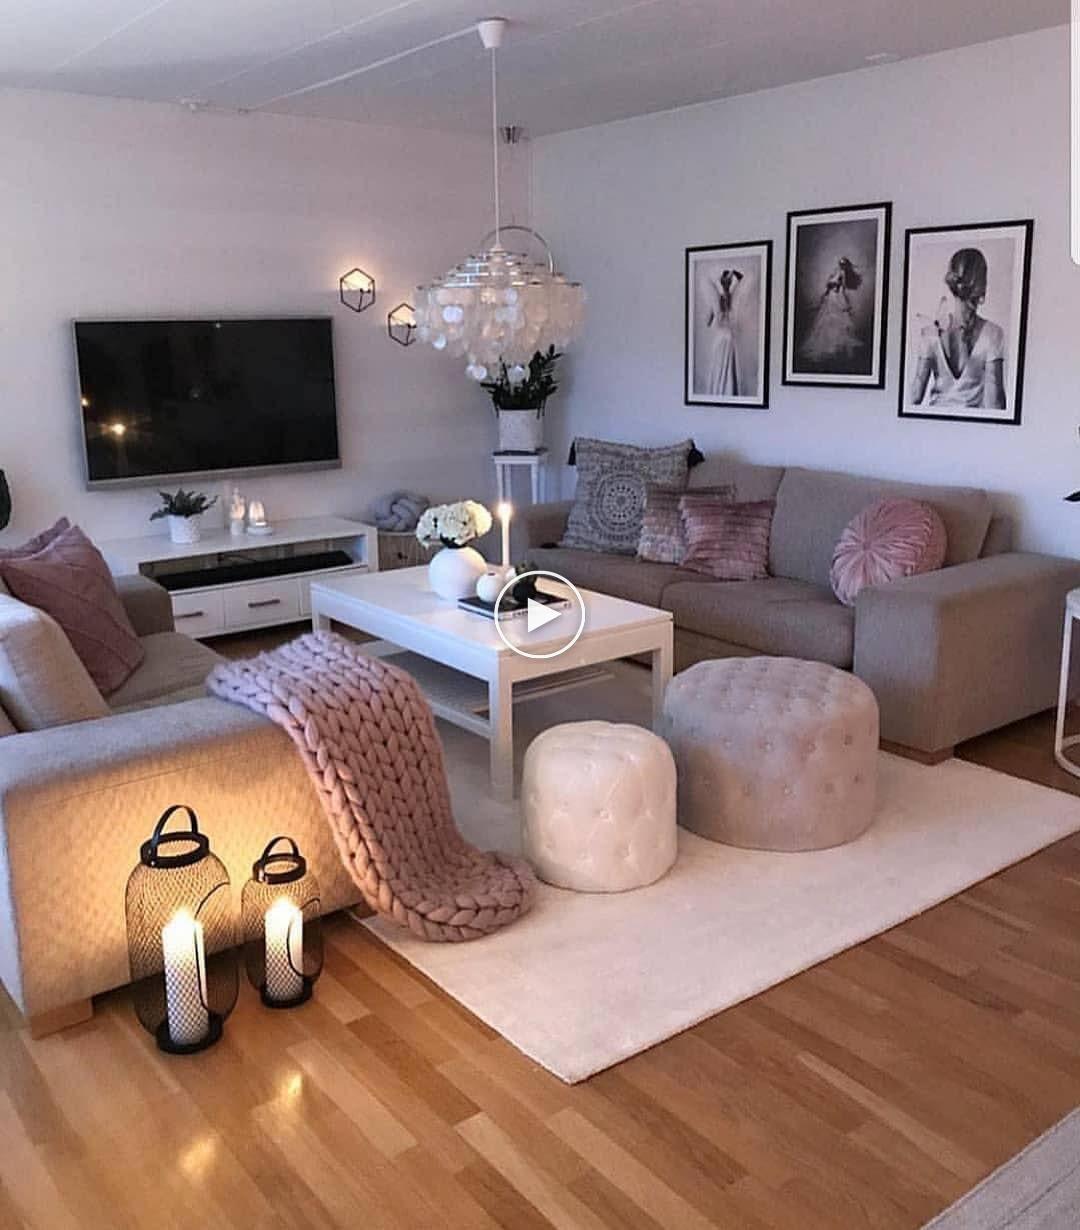 Photo of Udekkete møbler Stue Ekstra sitteplasser # hjemmekake #Hvordan …